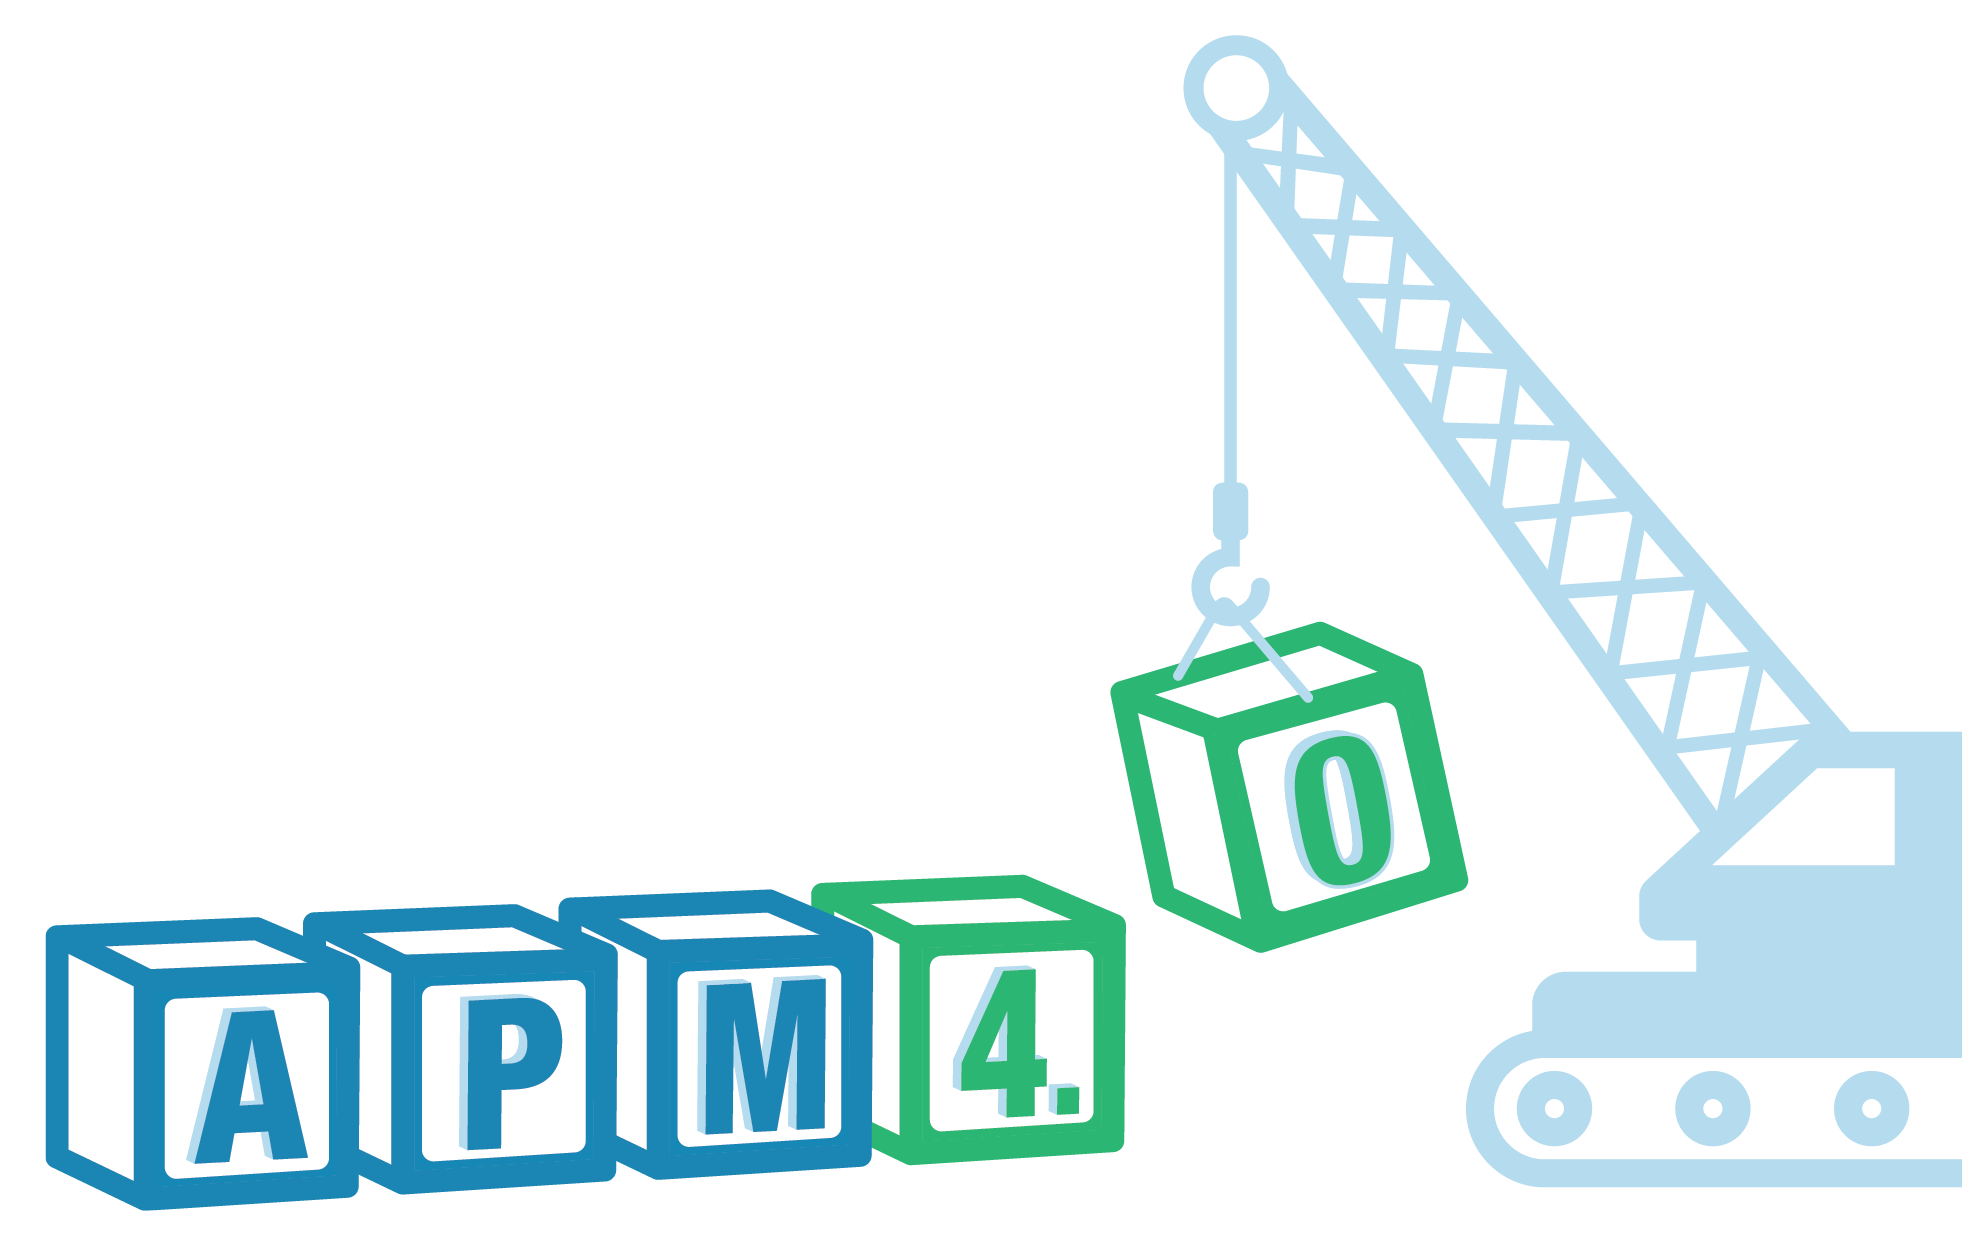 APM 4.0